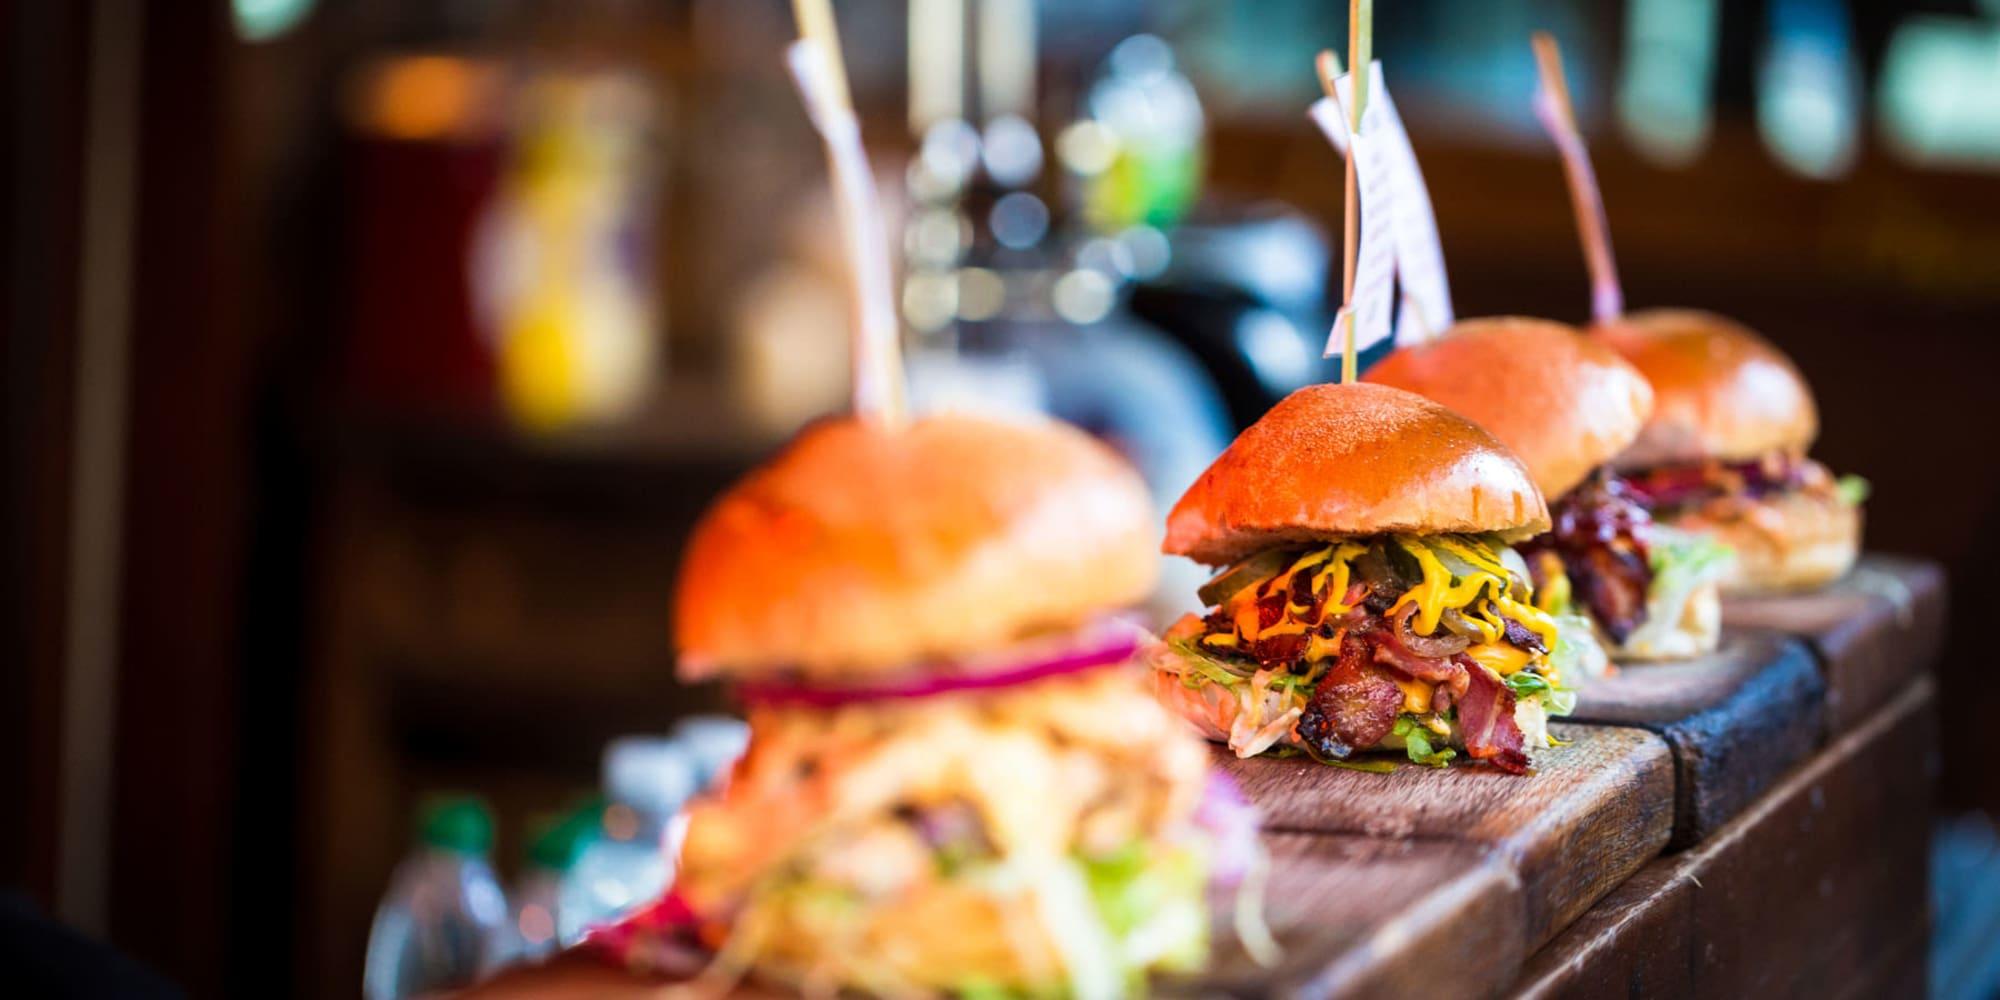 Tasty cheeseburgers on the bar at a locals' favorite restaurant near Mediterranean Village in West Hollywood, California